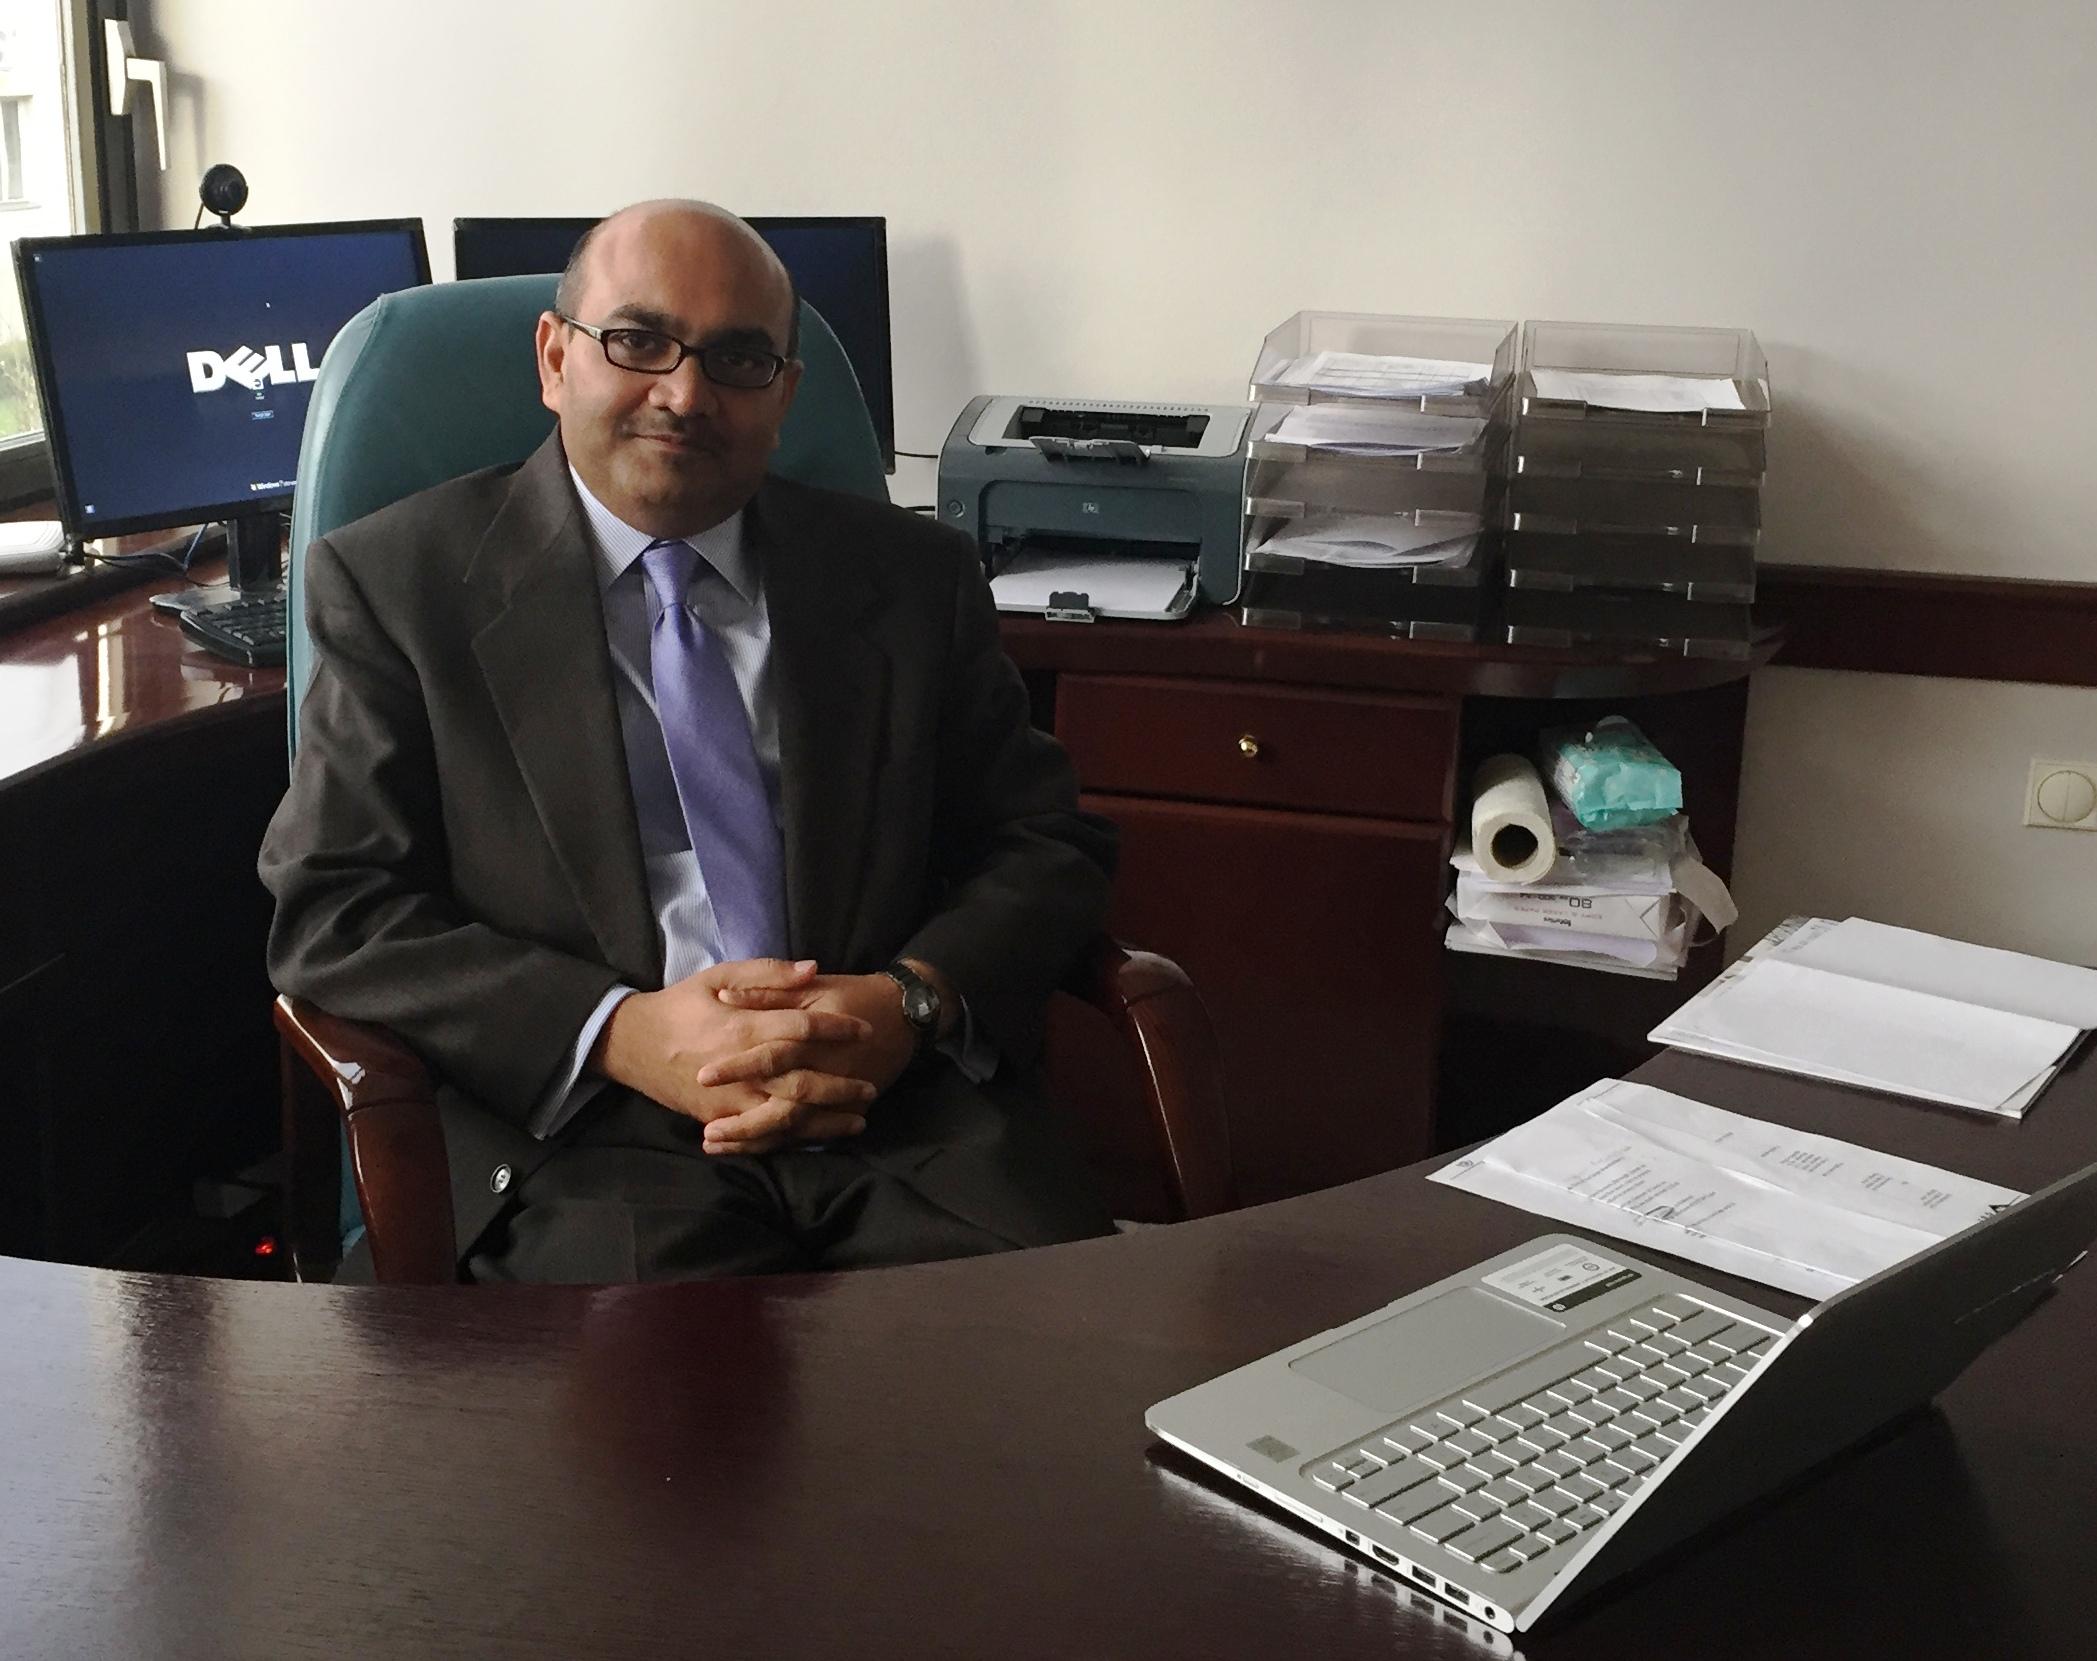 RS traži međunarodnu pomoć u istrazi protiv Aggarwala